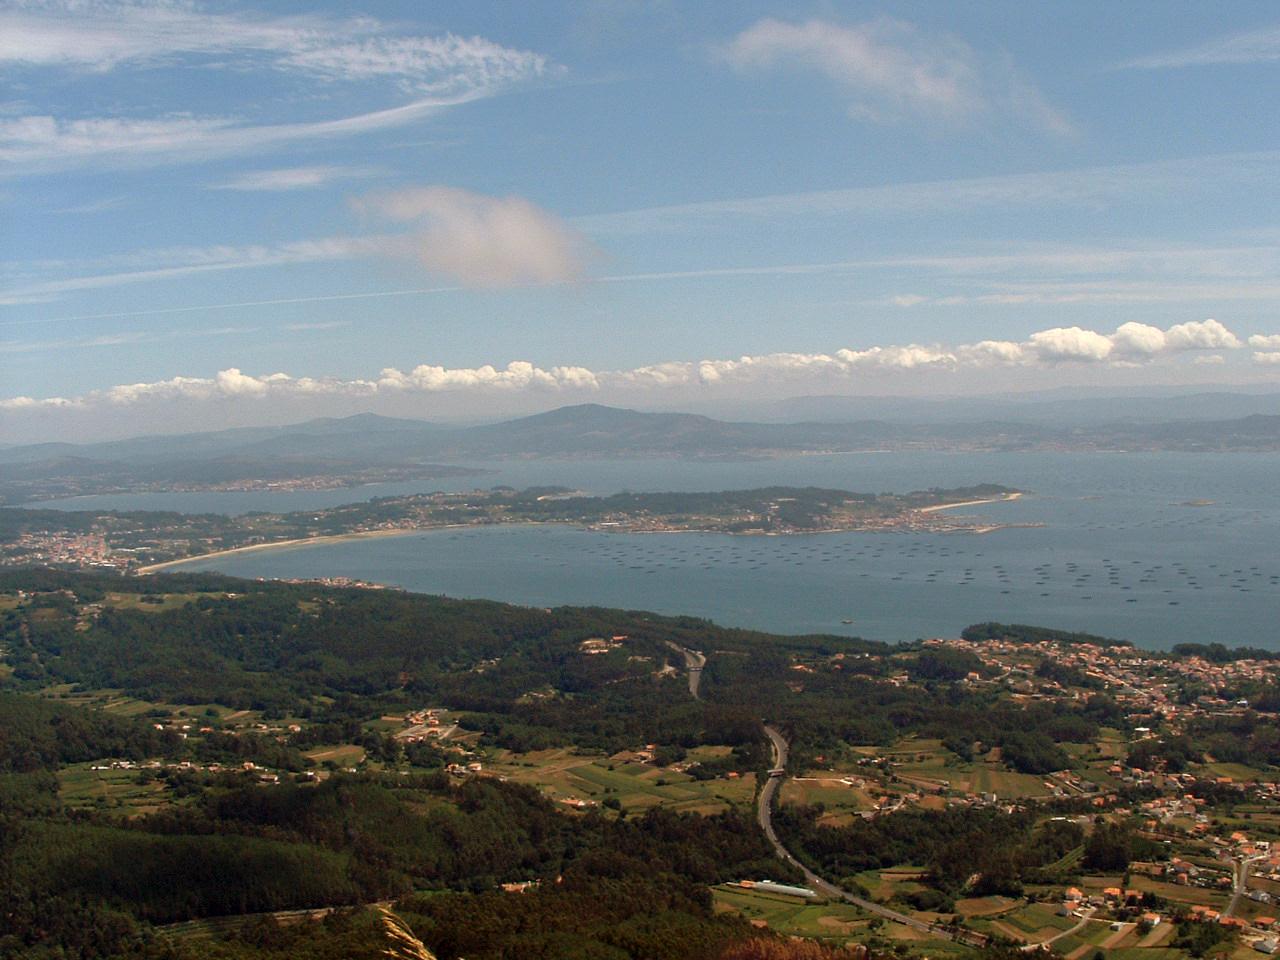 Galicia. Rias Bajas